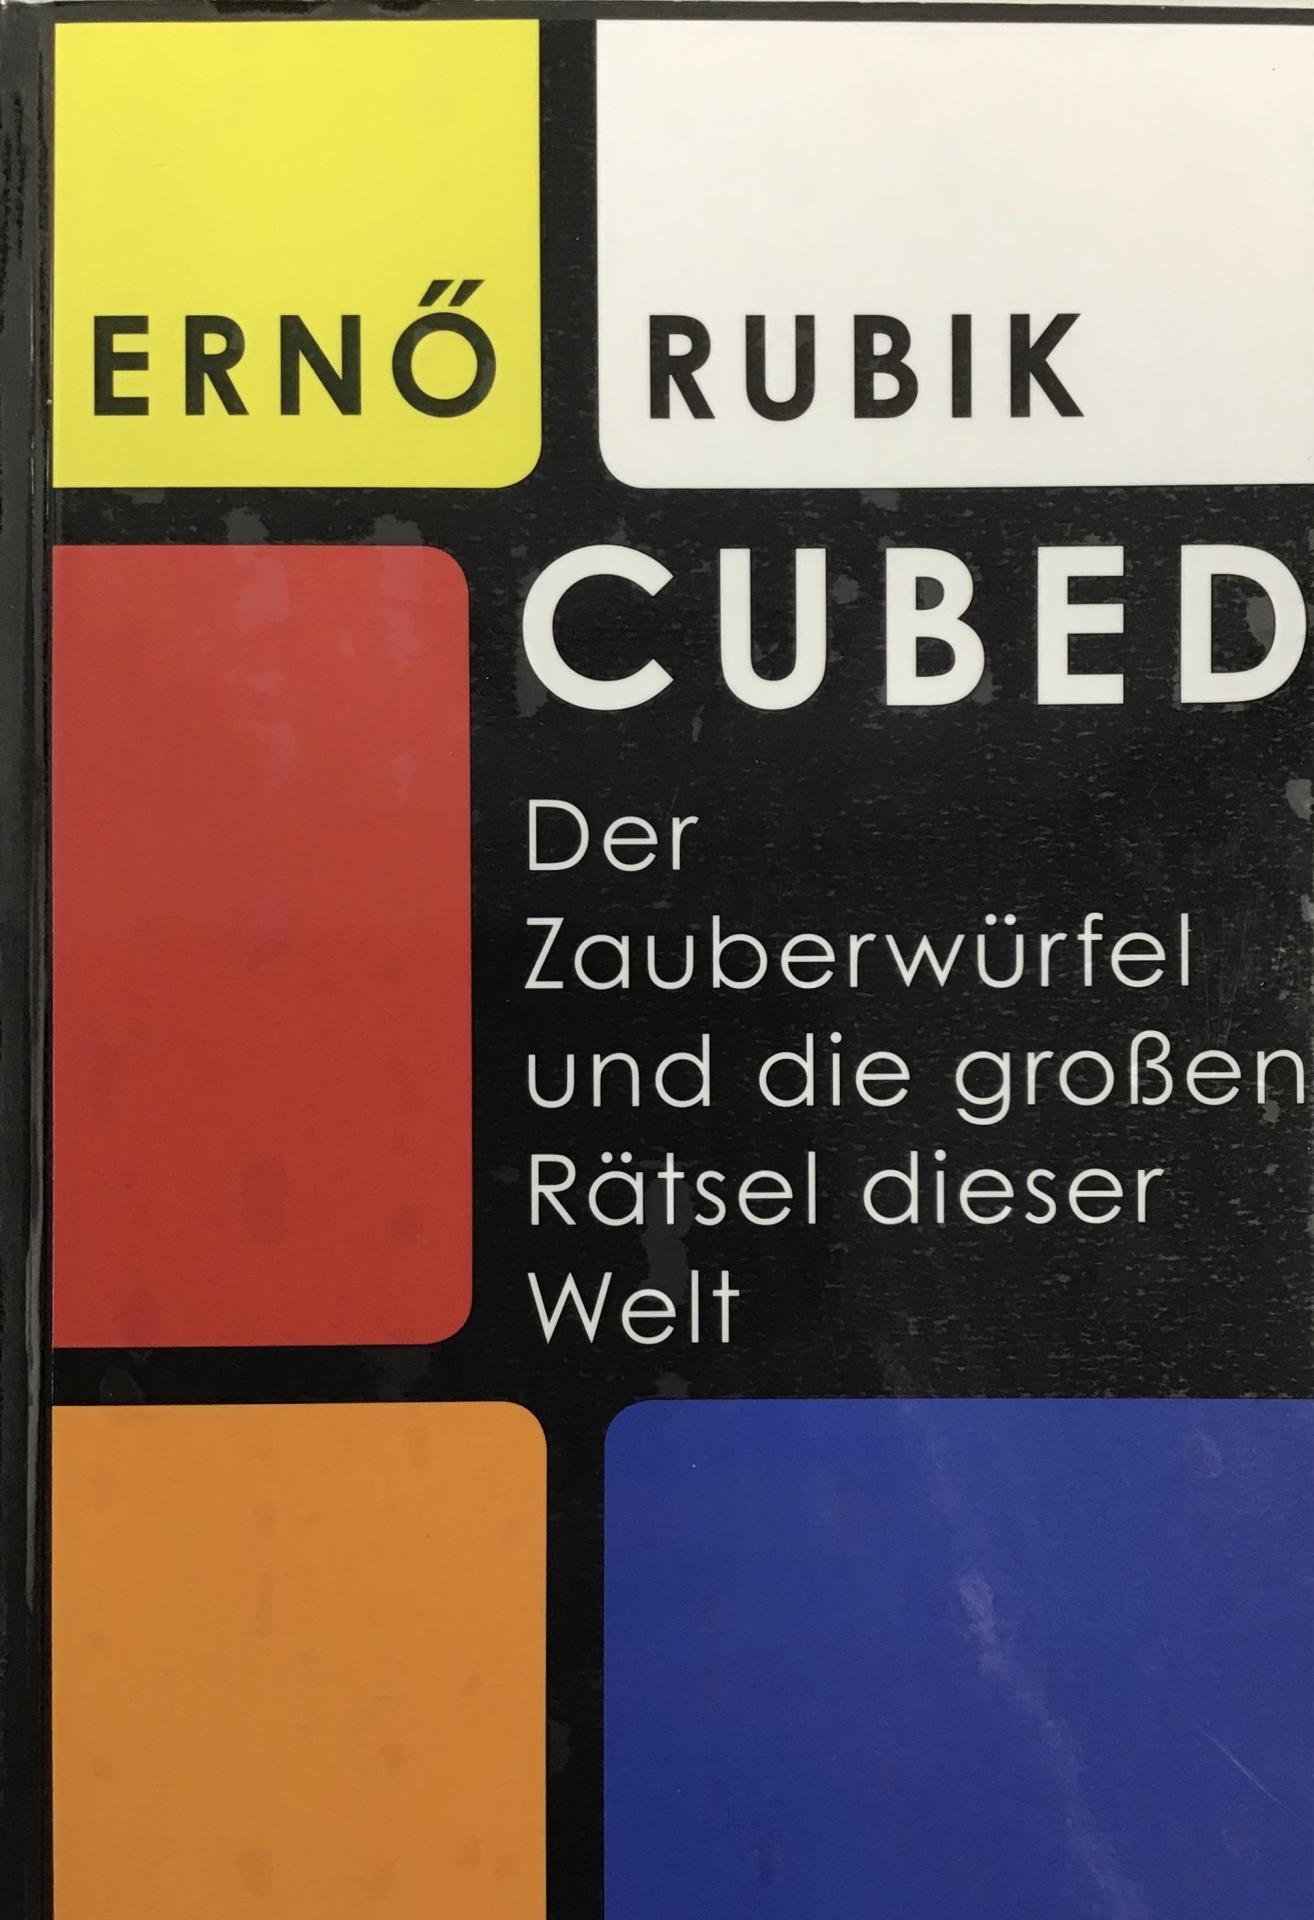 Buchcover-Aufnahme L.Podendorf